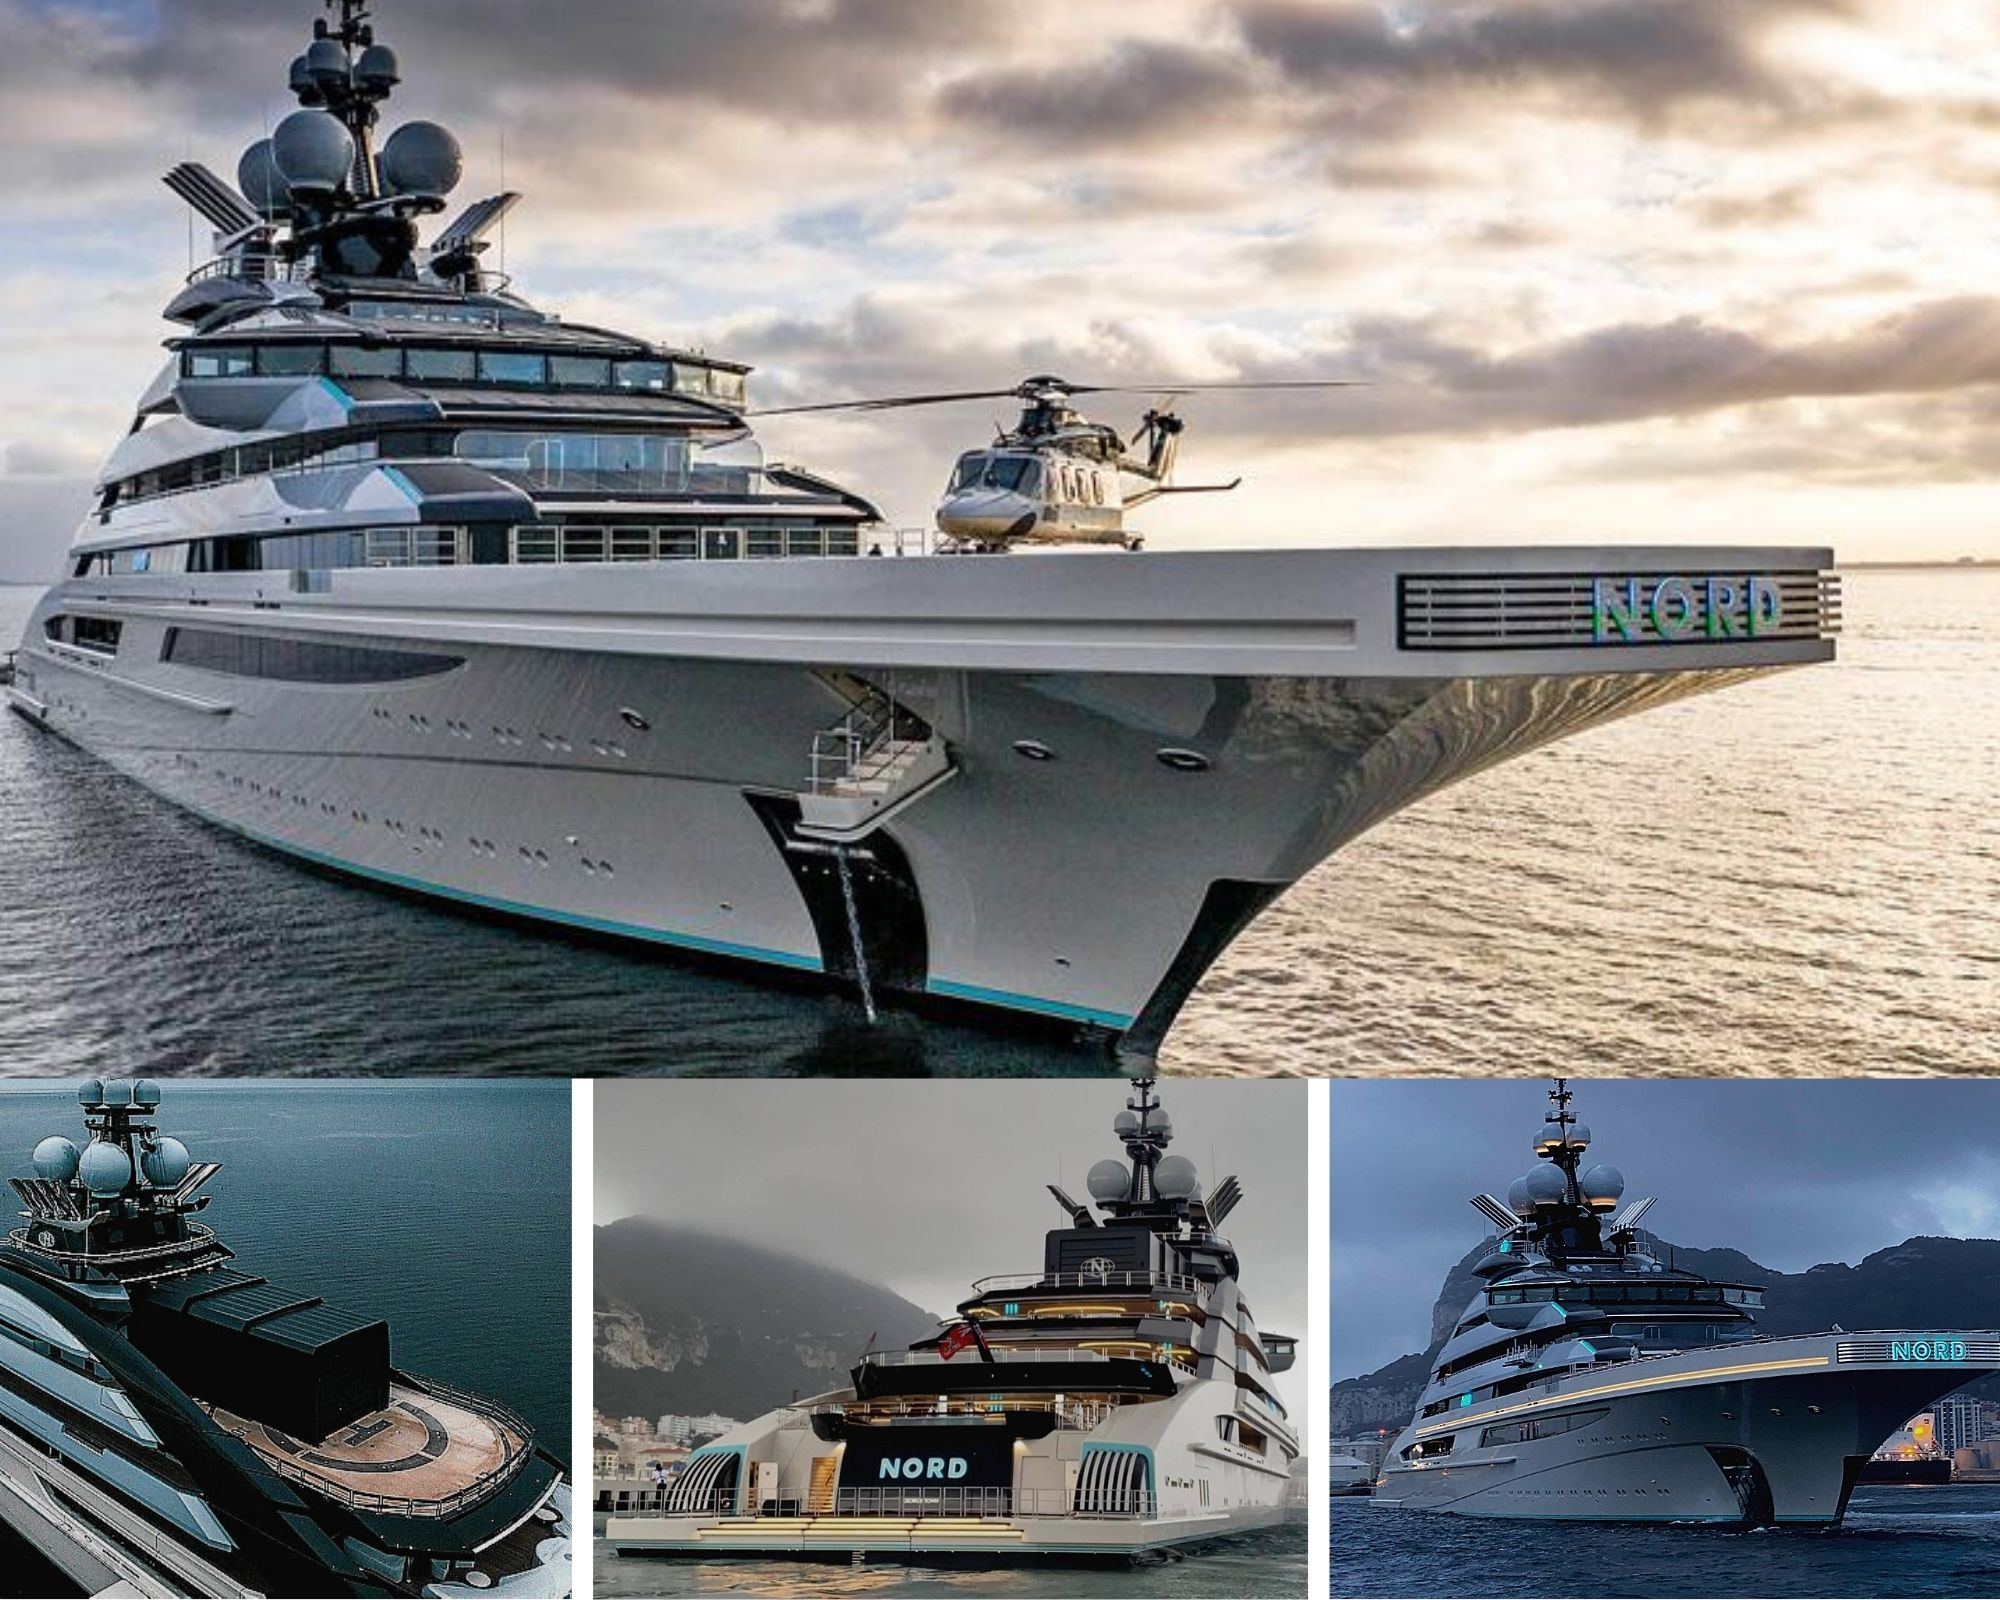 Luxury Yacht Nord